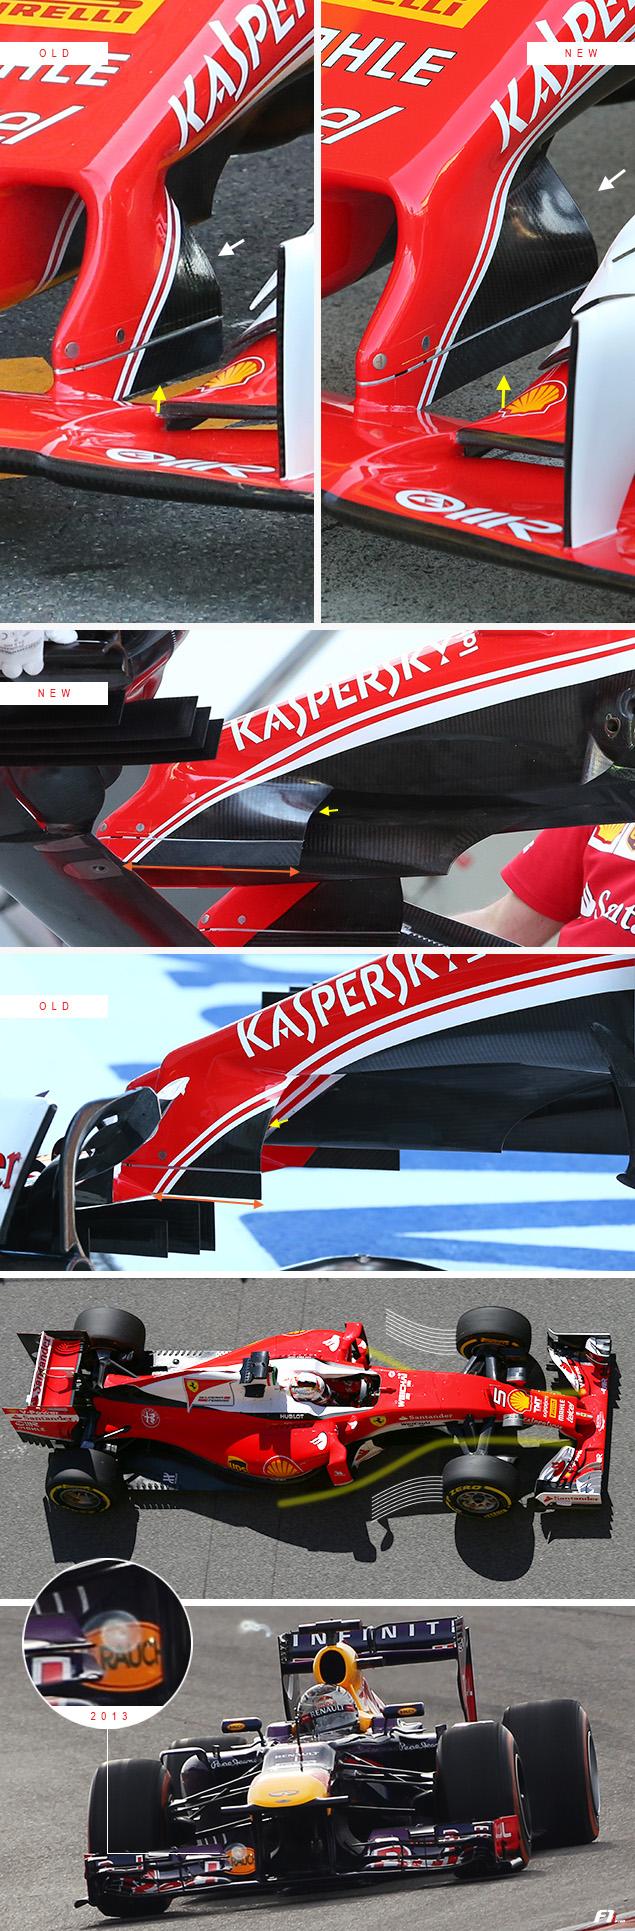 F1 Technical Analysis Suzuka F1i Com